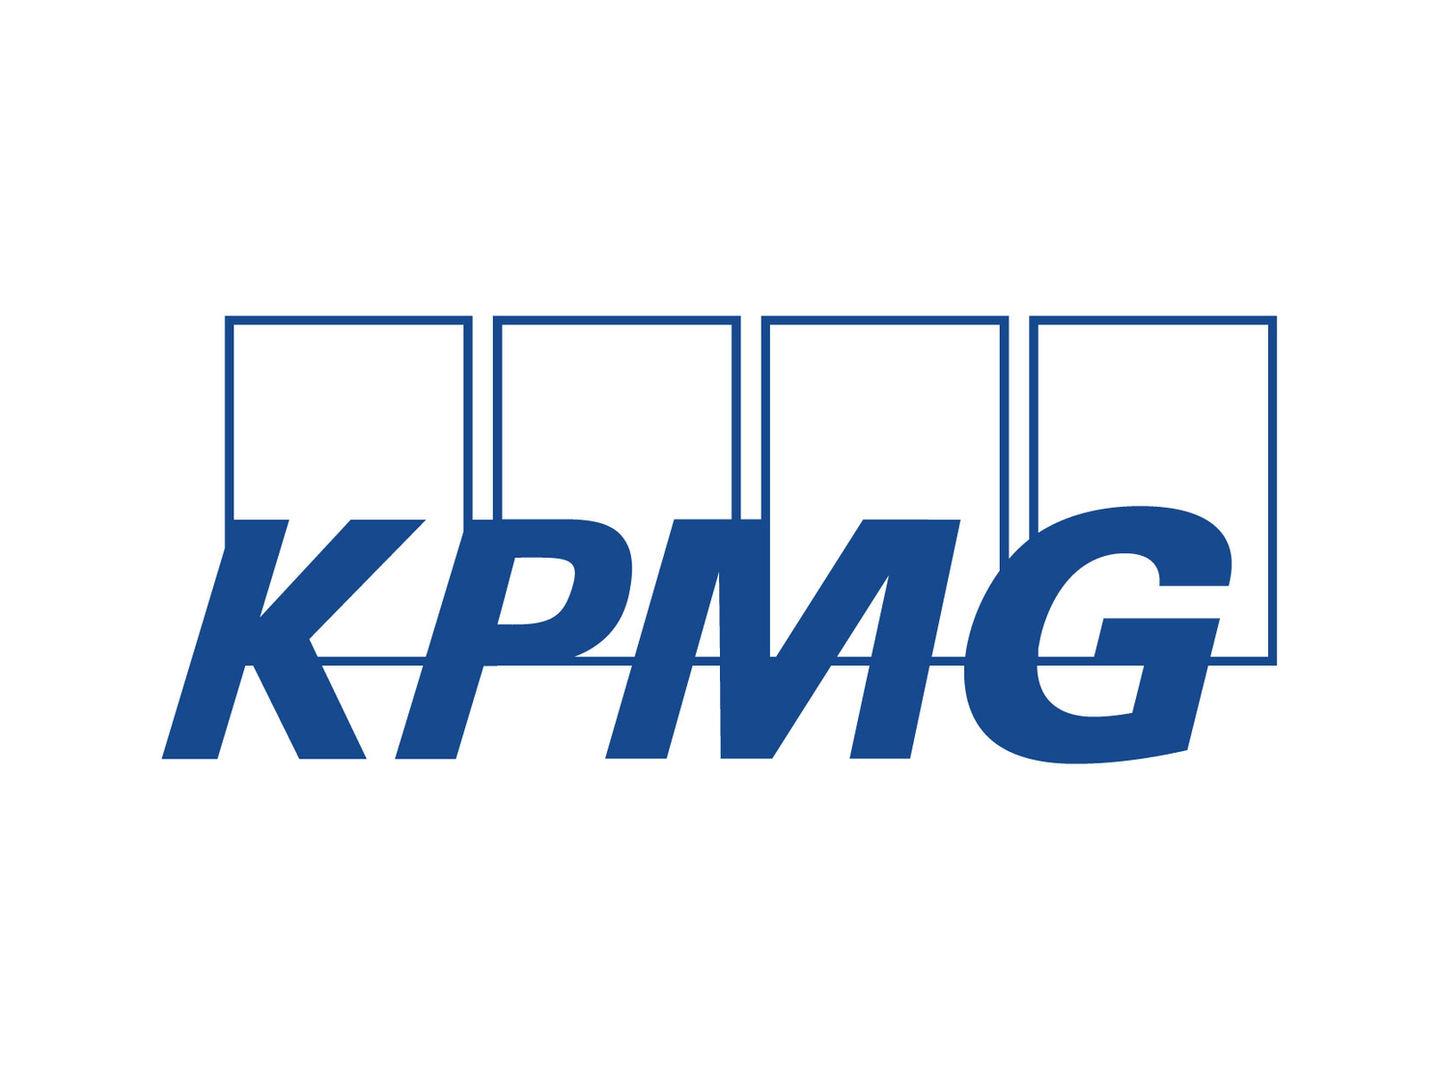 2019sponsor_logos_4-3-KPMG.jpg